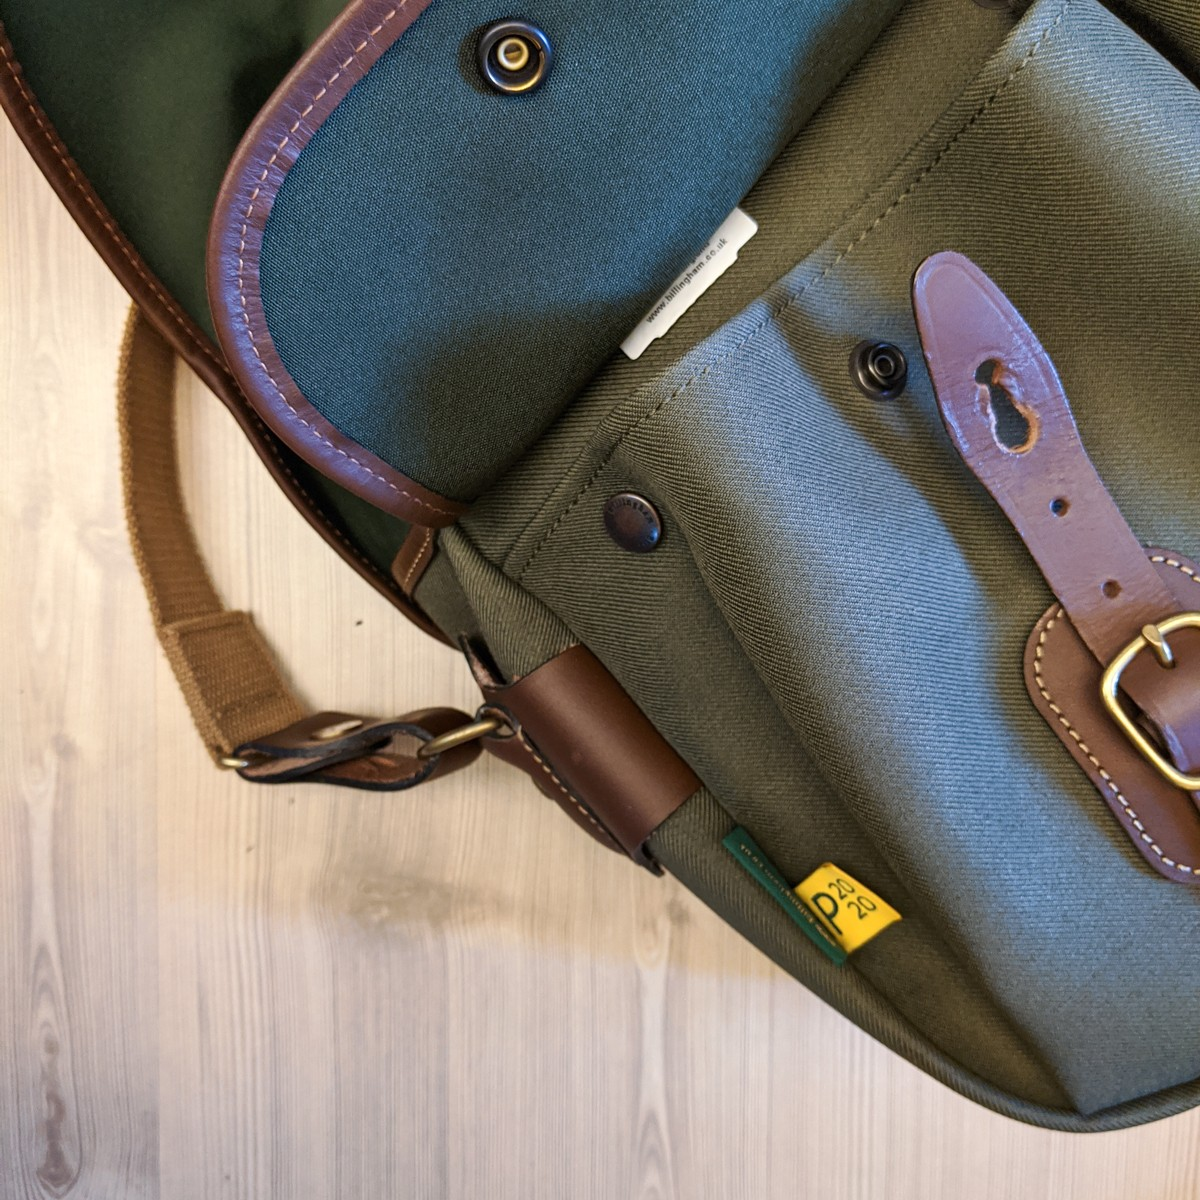 Billingham Hadley Pro 2020 - Detail - Front pocket pinched shut